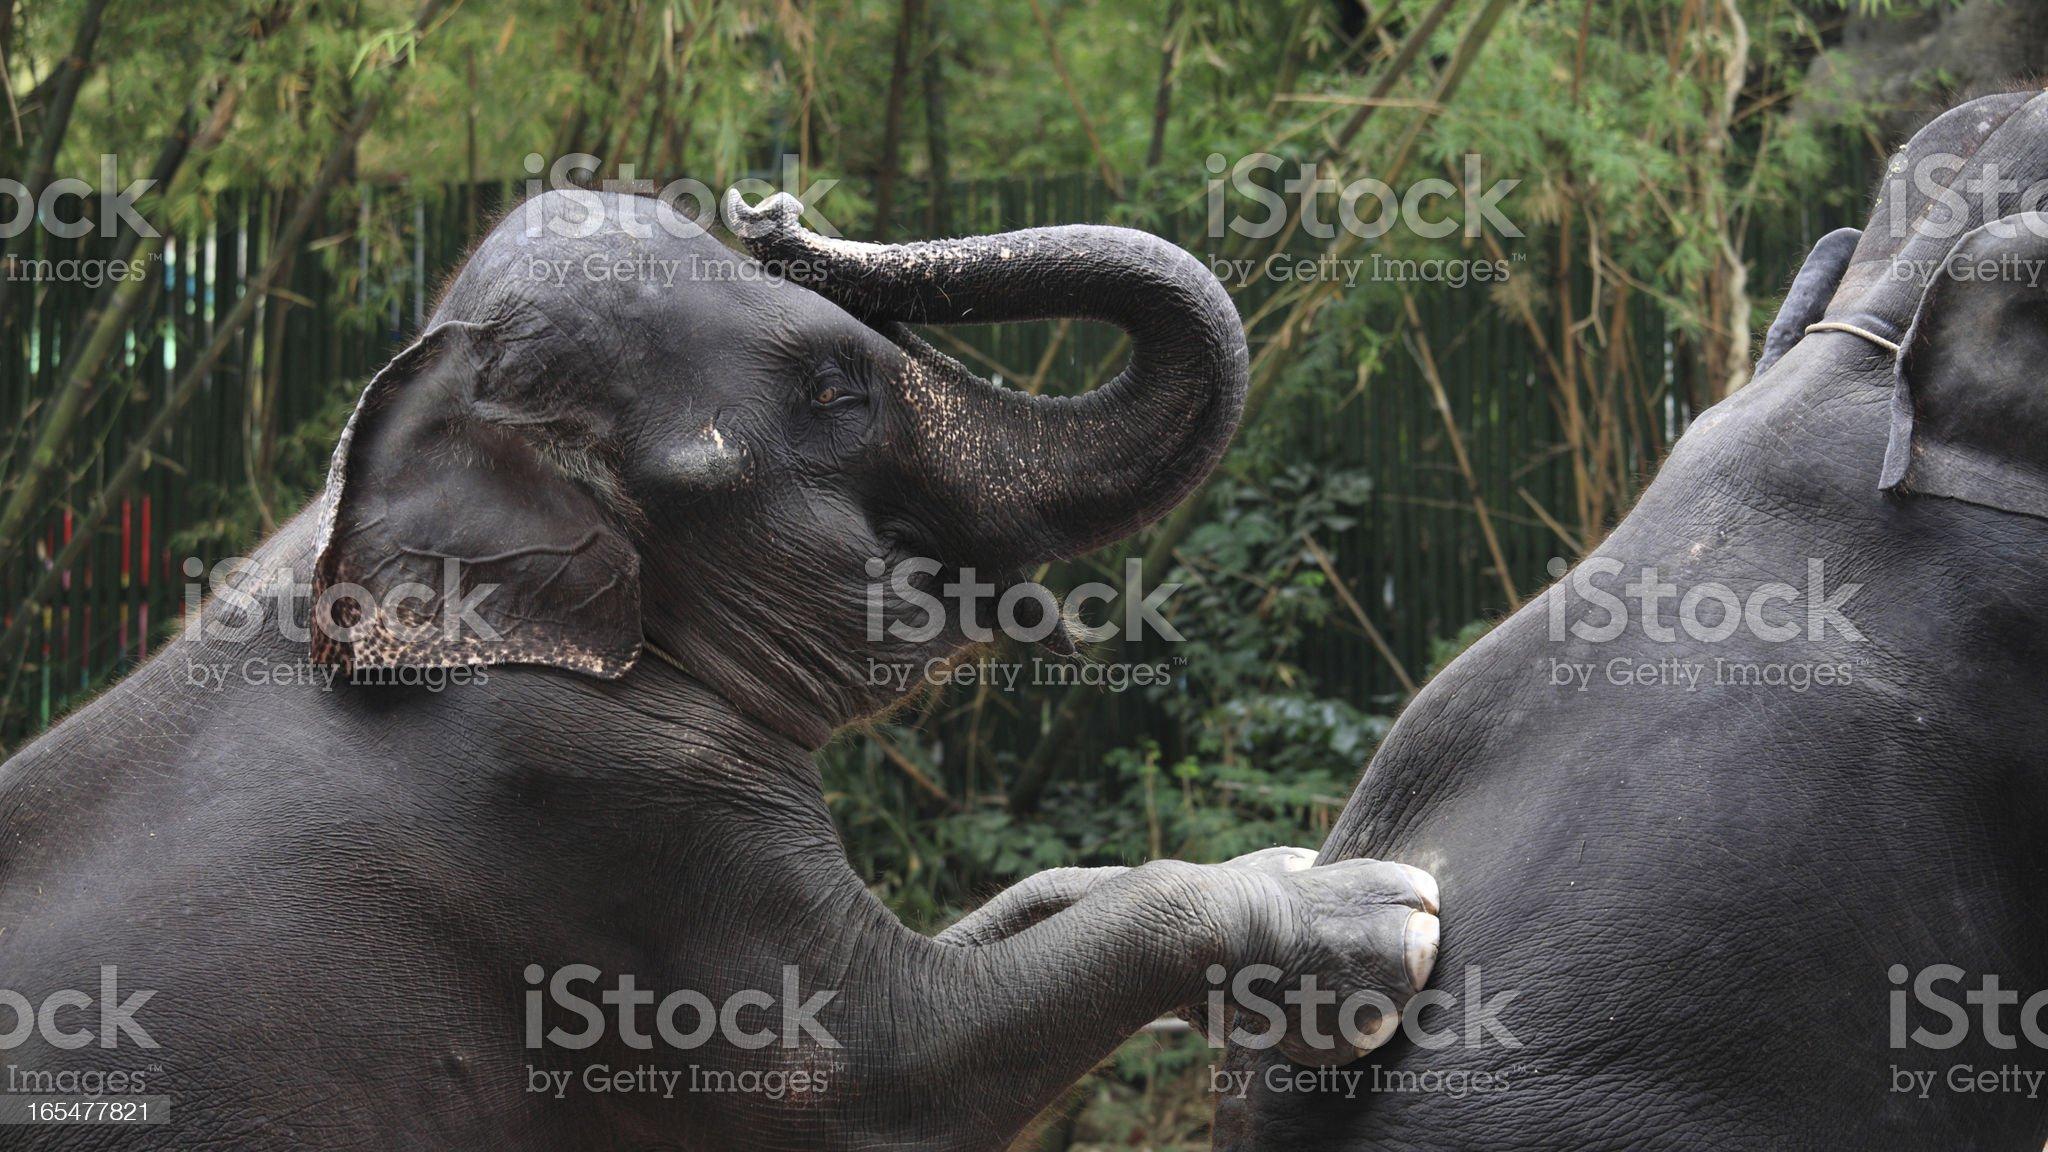 Adorable elephants show royalty-free stock photo